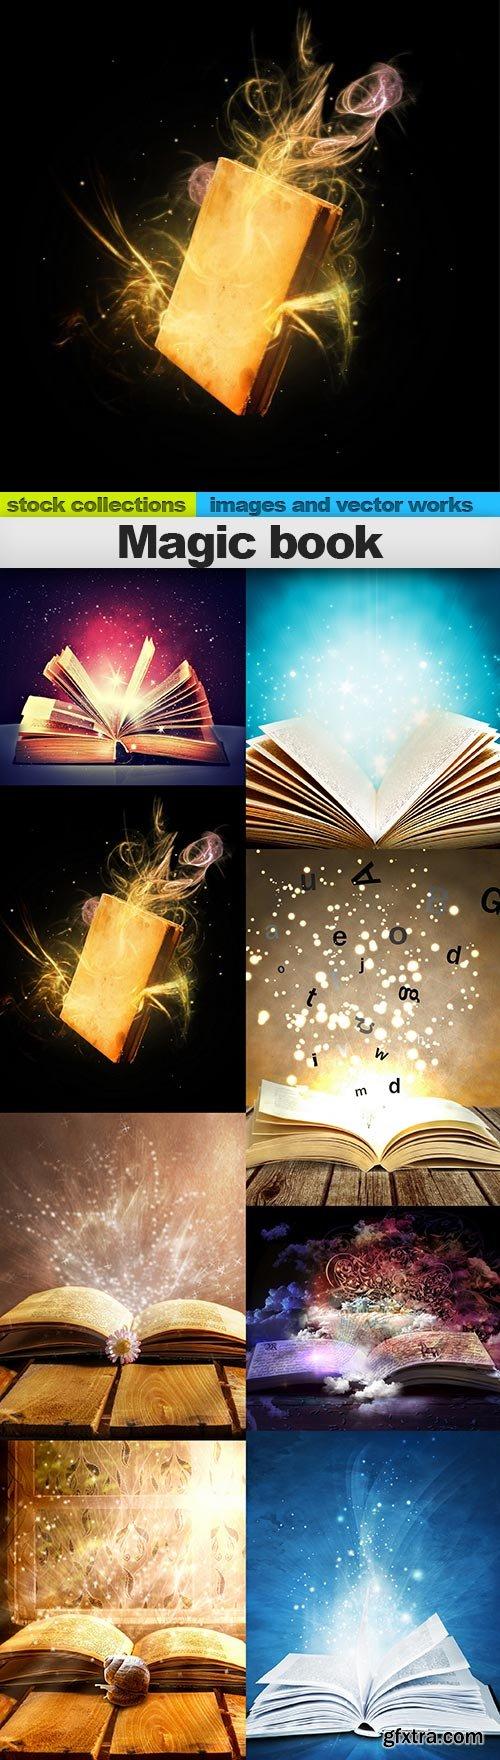 Magic book, 08 x UHQ JPEG